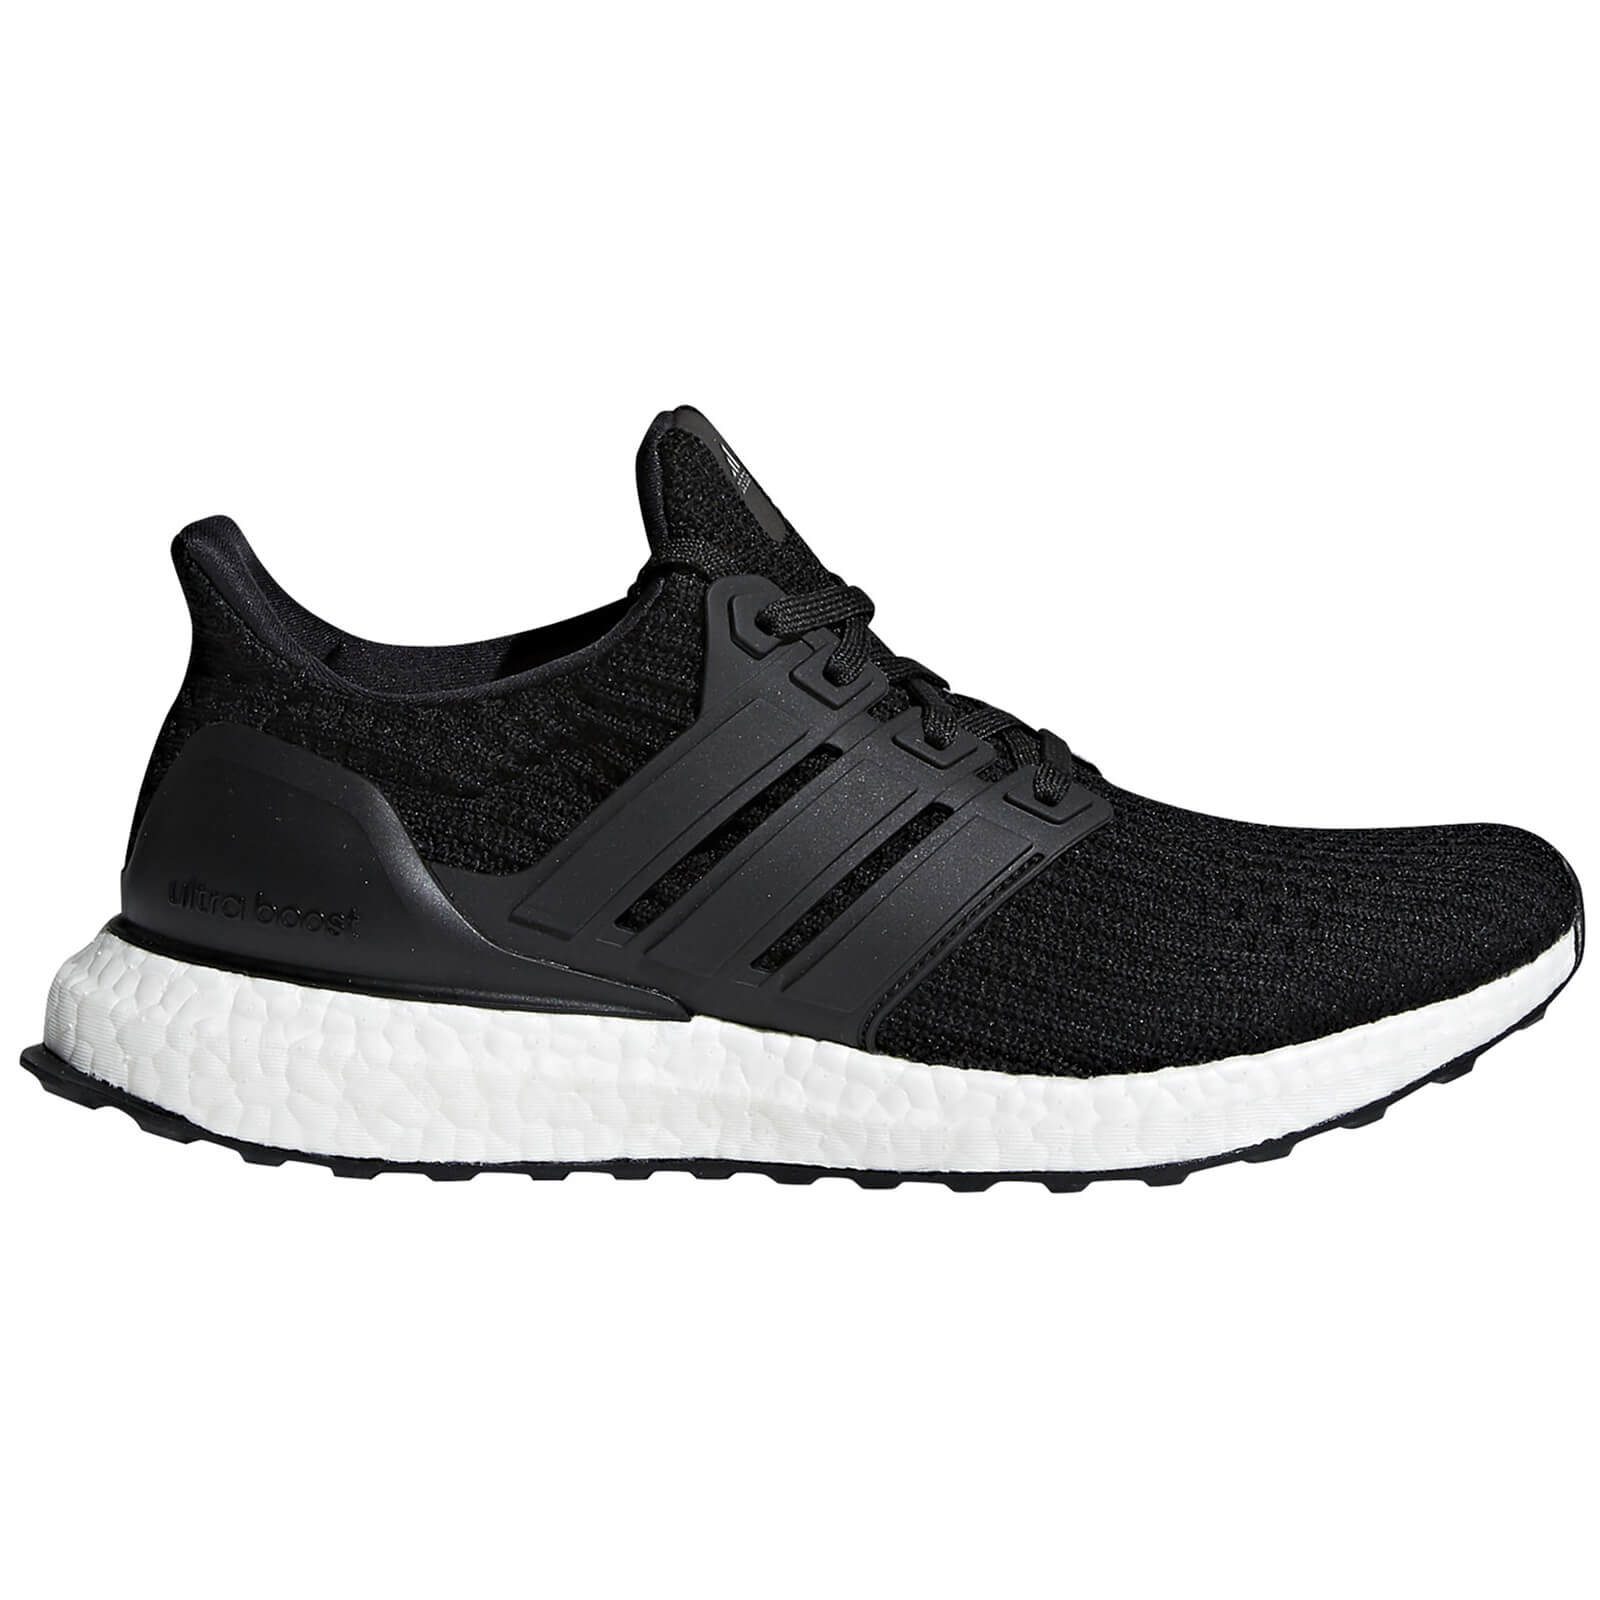 1edb4003c89 adidas Women's Ultraboost Trainers - Core Black | ProBikeKit.com